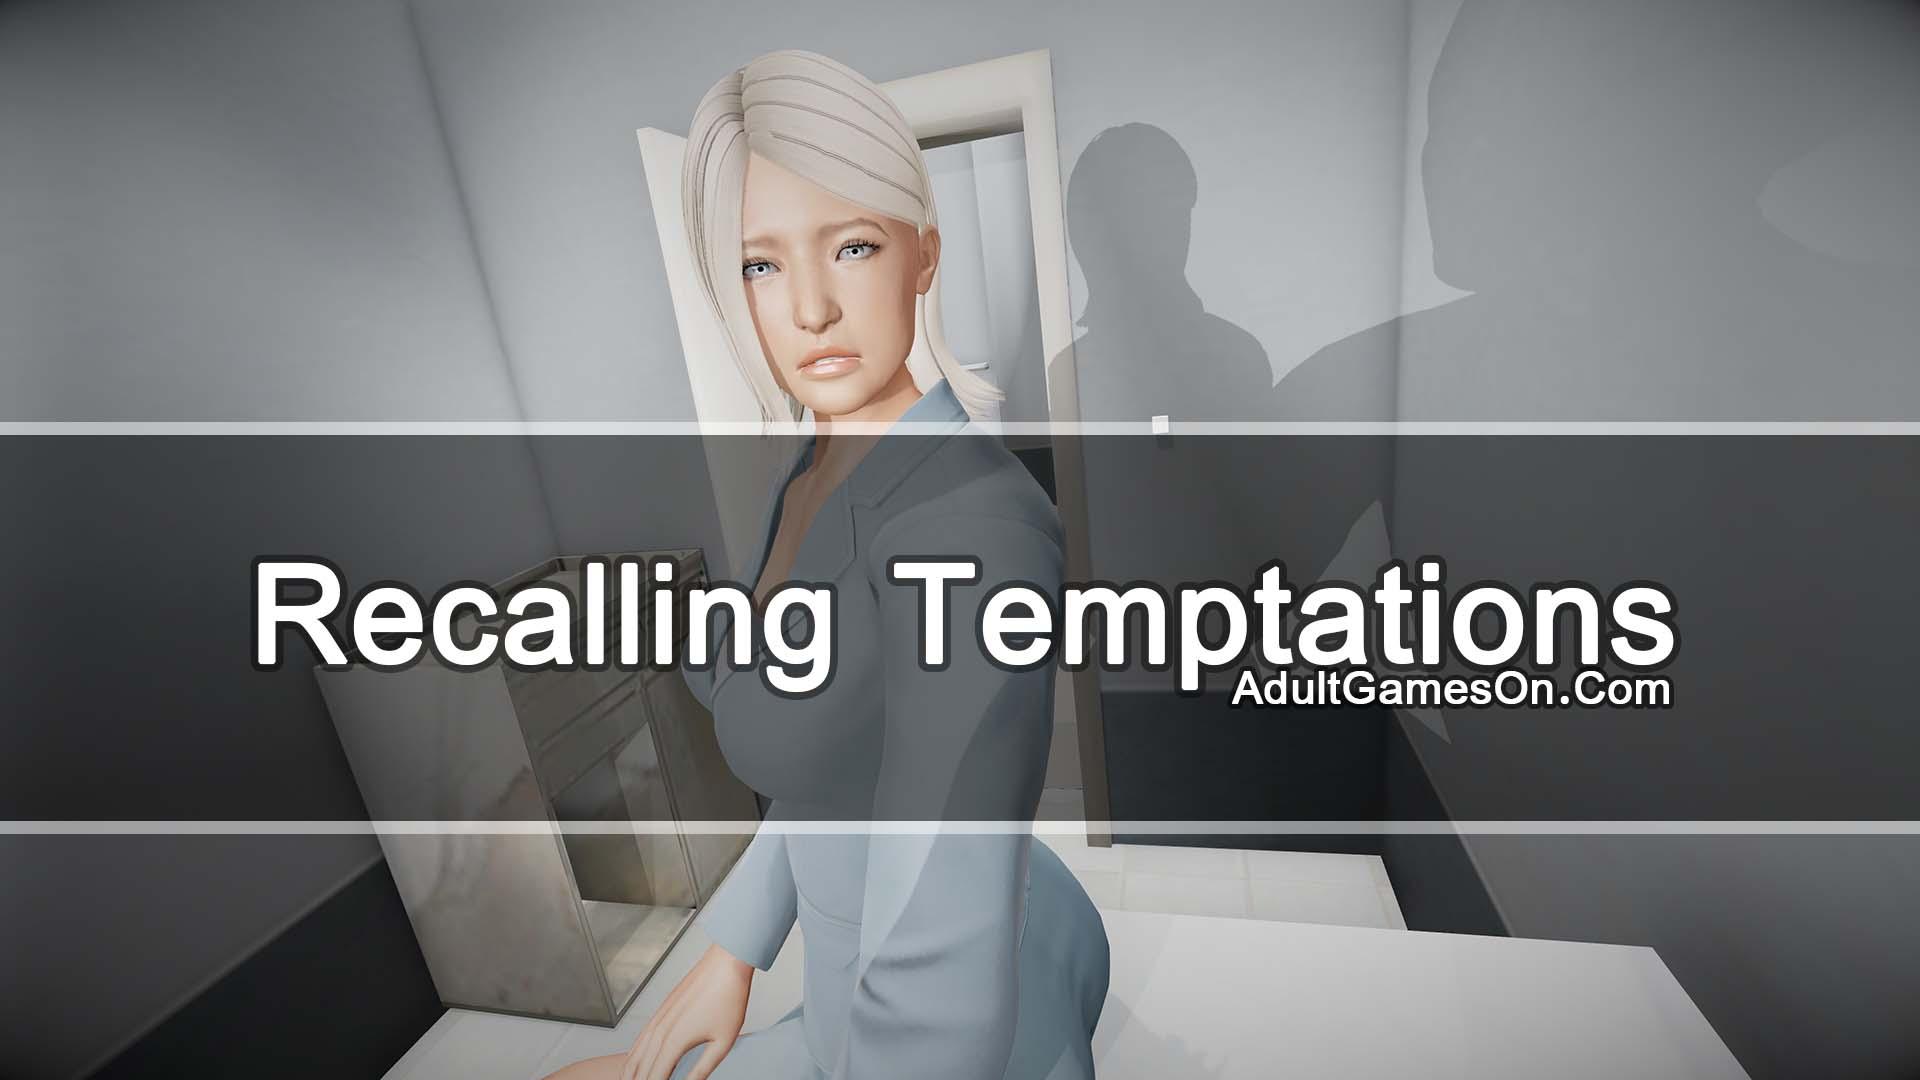 Recalling Temptations